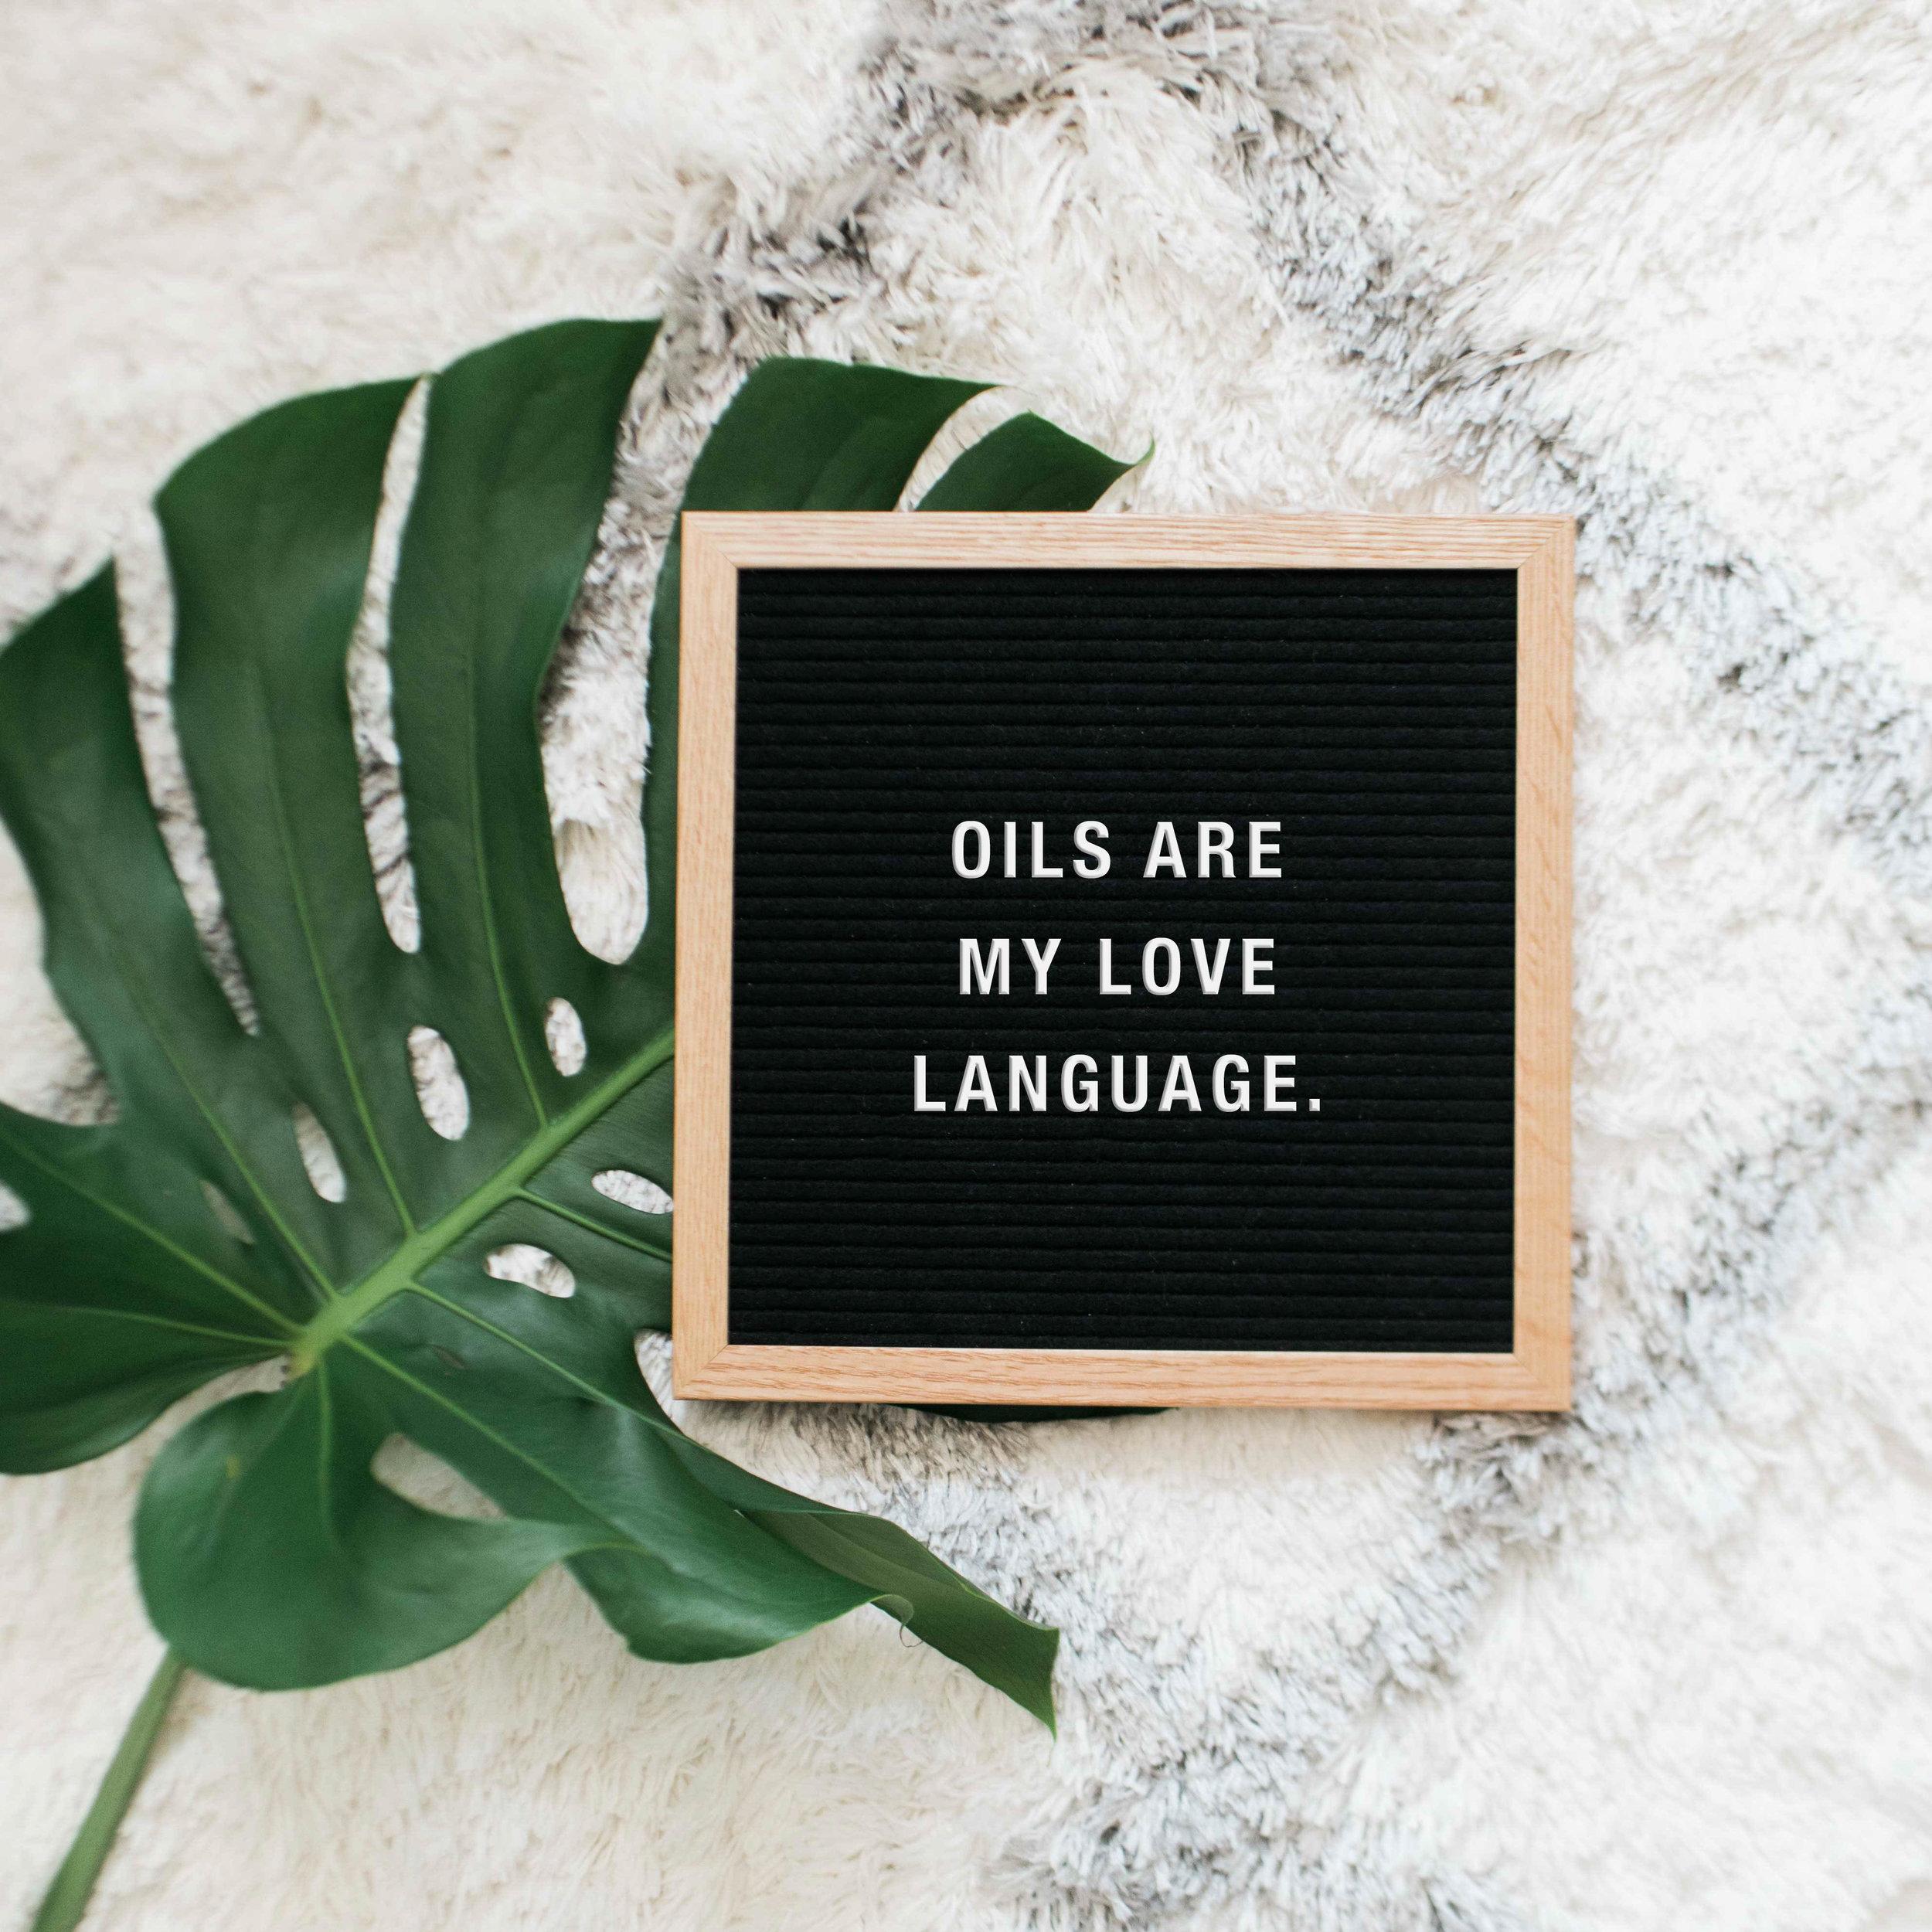 OILS-ARE-MY-LOVE-LANGUAGE.jpg